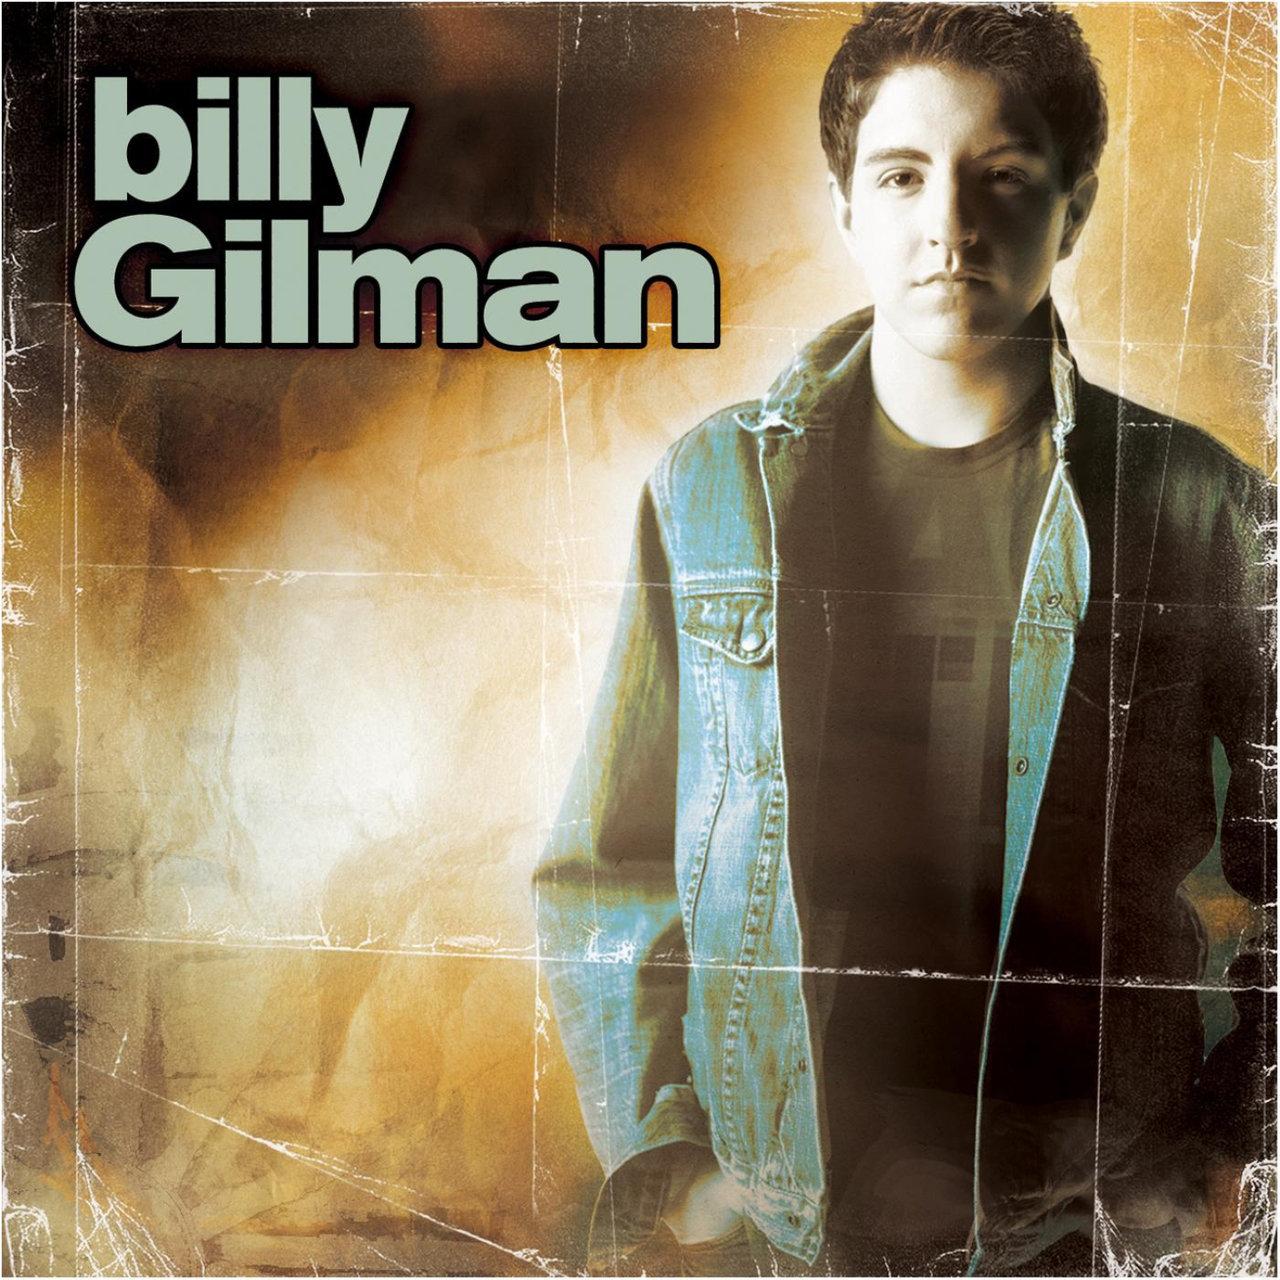 Billy Gilman: Hit Songs